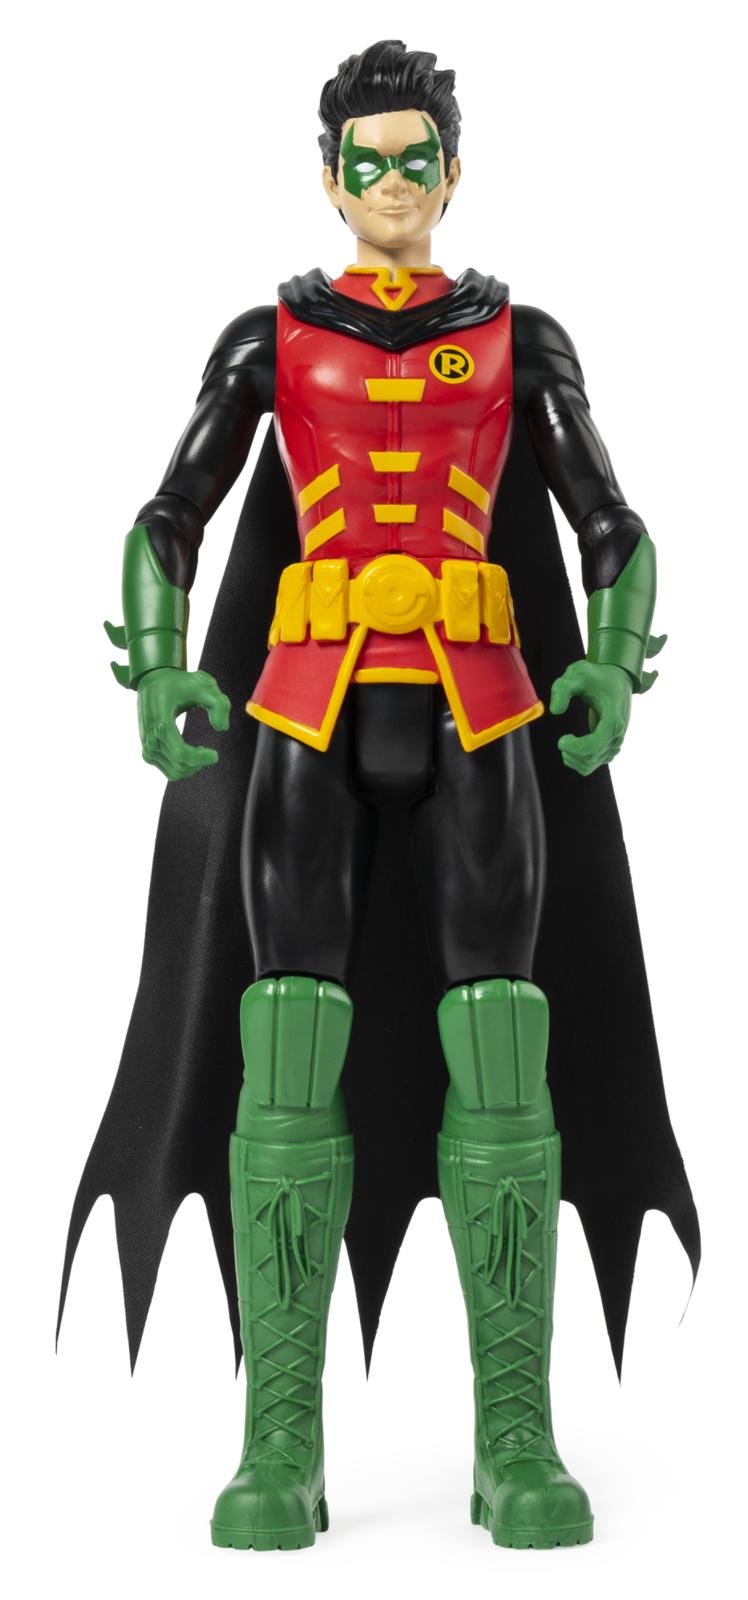 coolshop.co.uk - Batman – 30 cm Figure – Robin